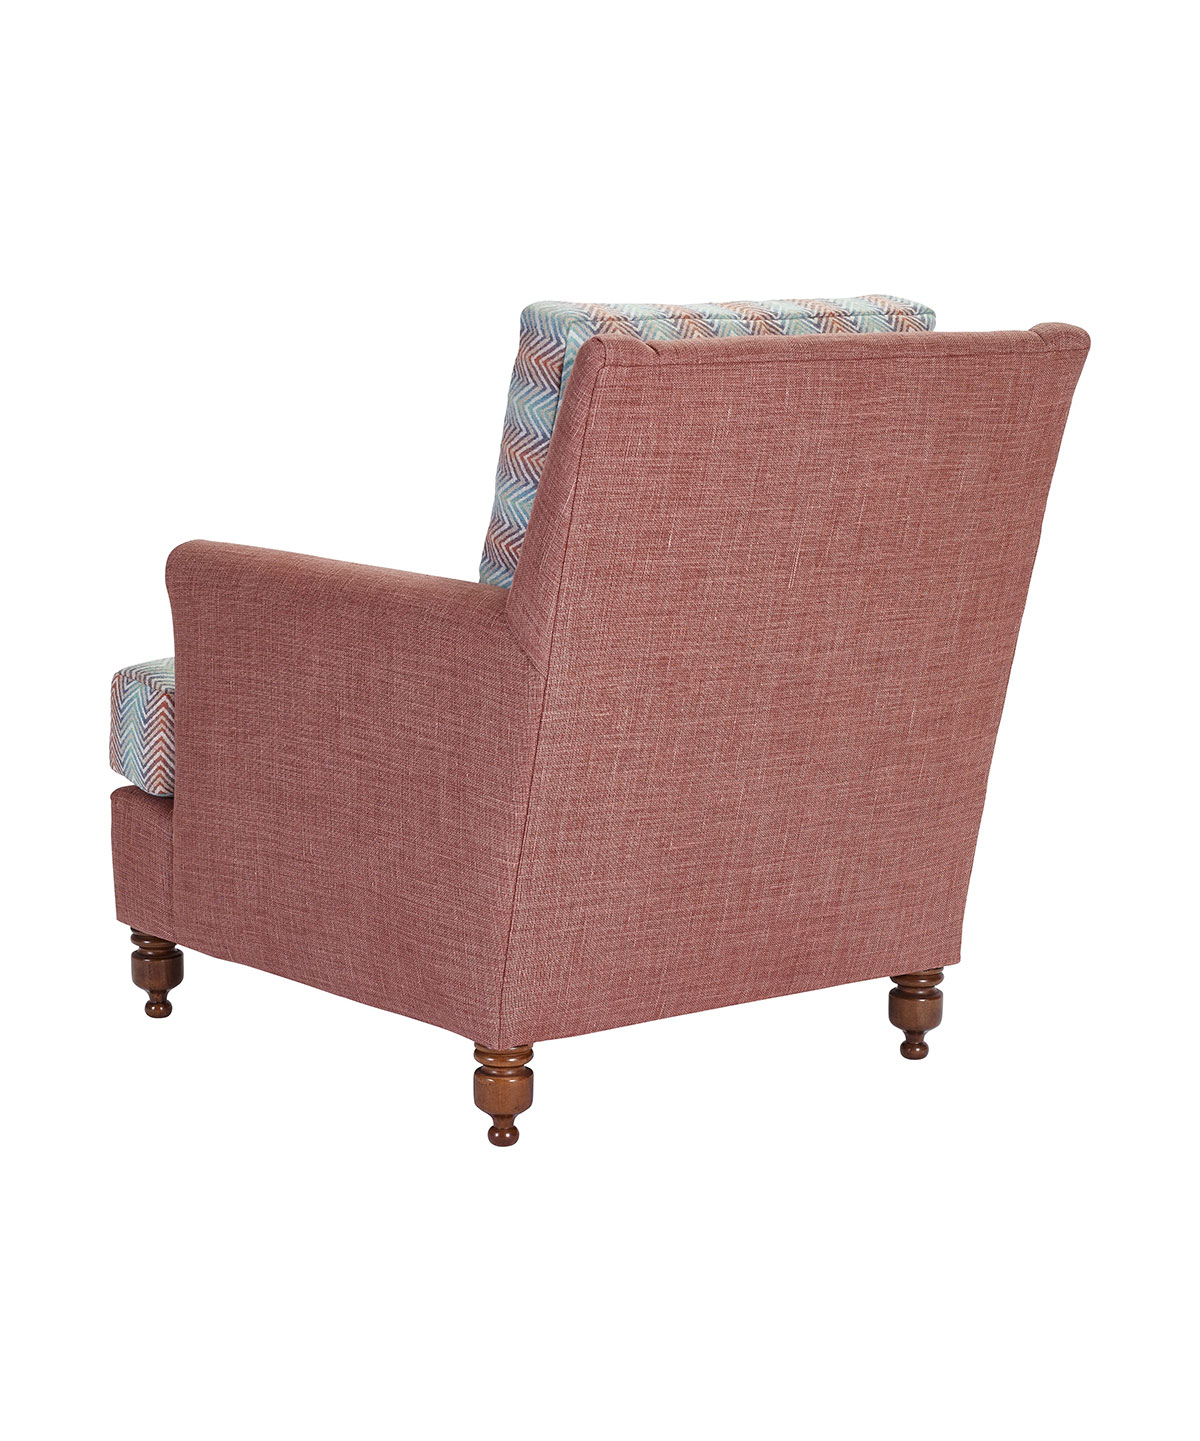 Bobbin Lounge Chair